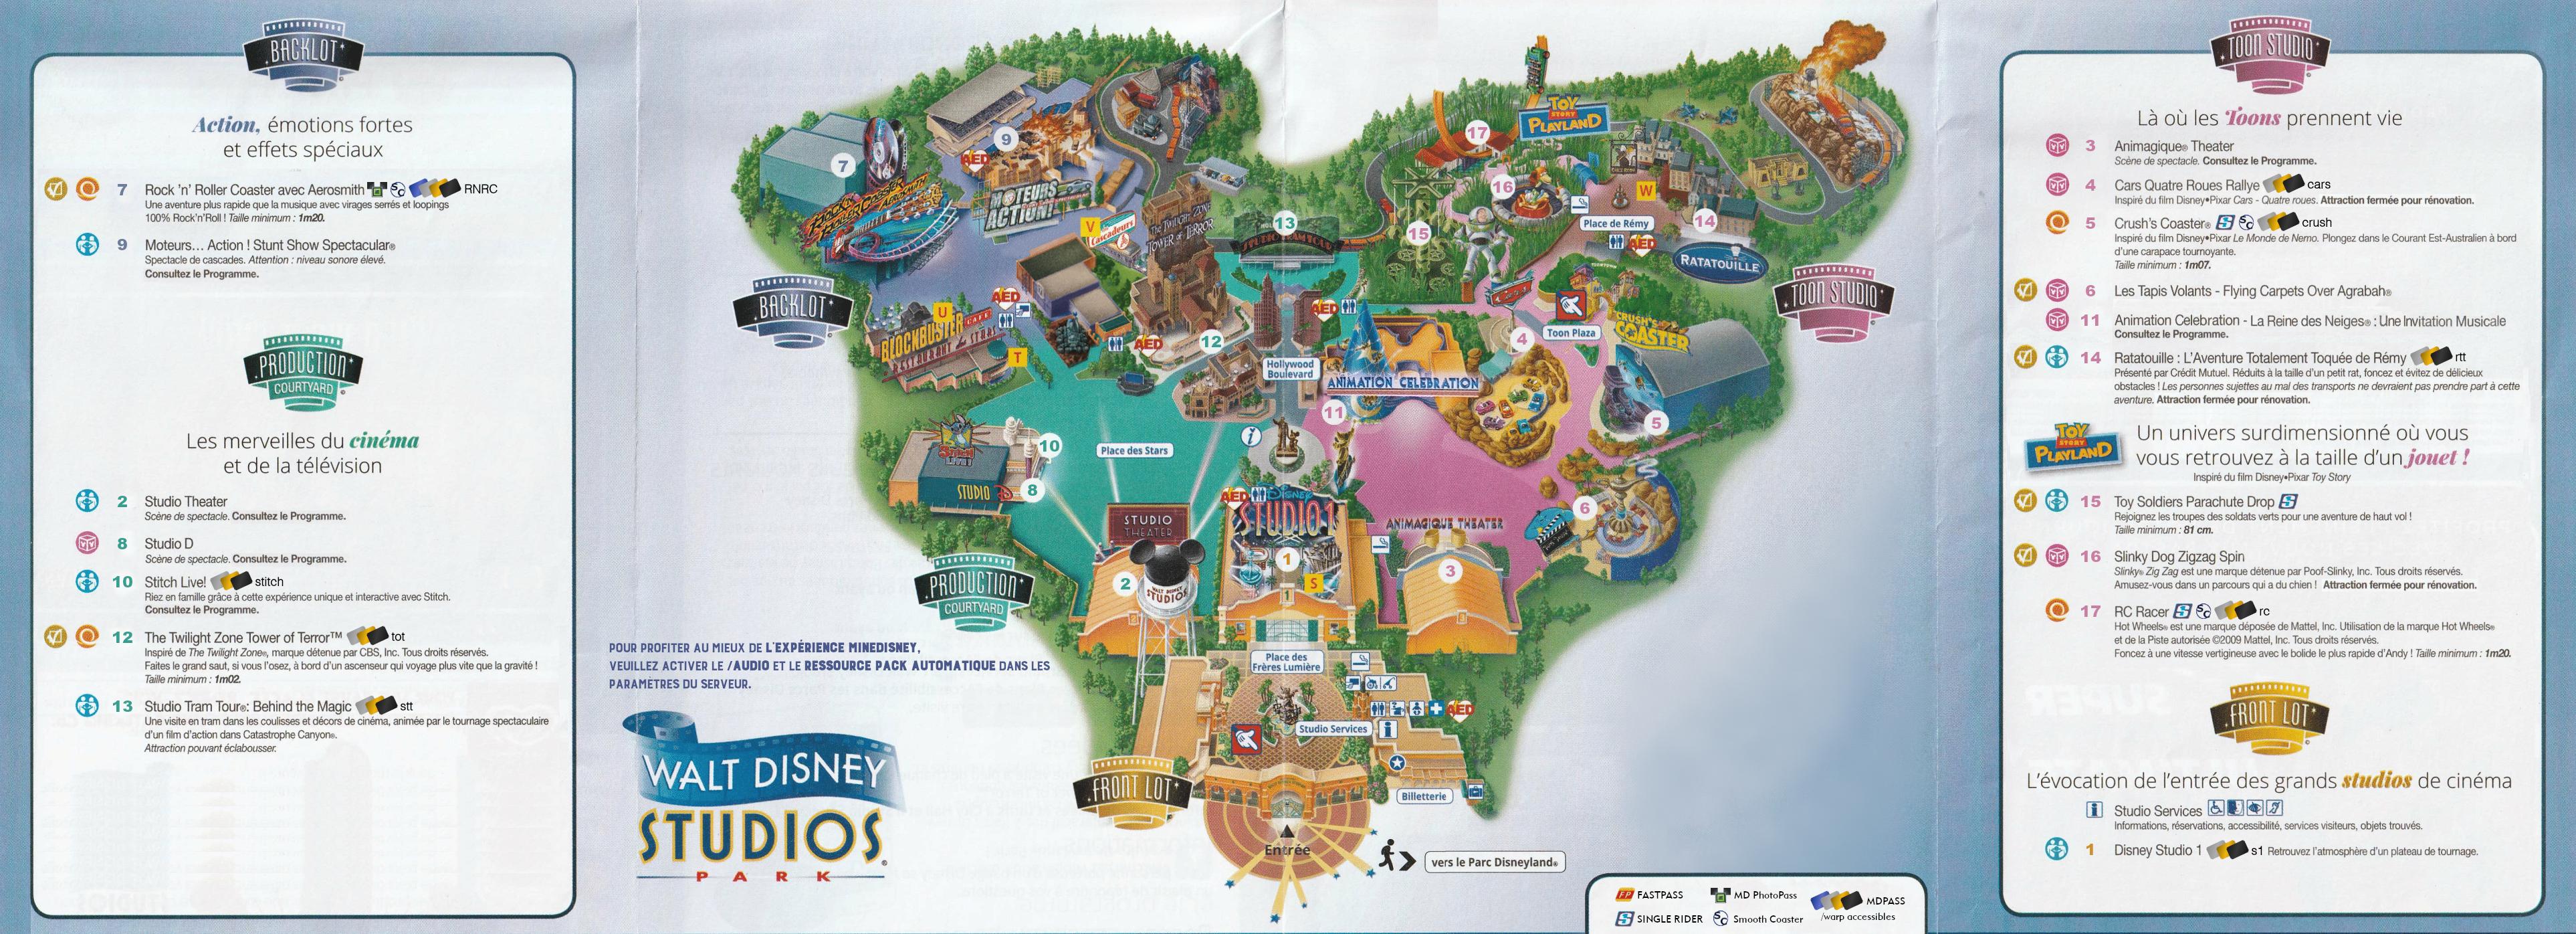 Plan - Walt Disney Studios